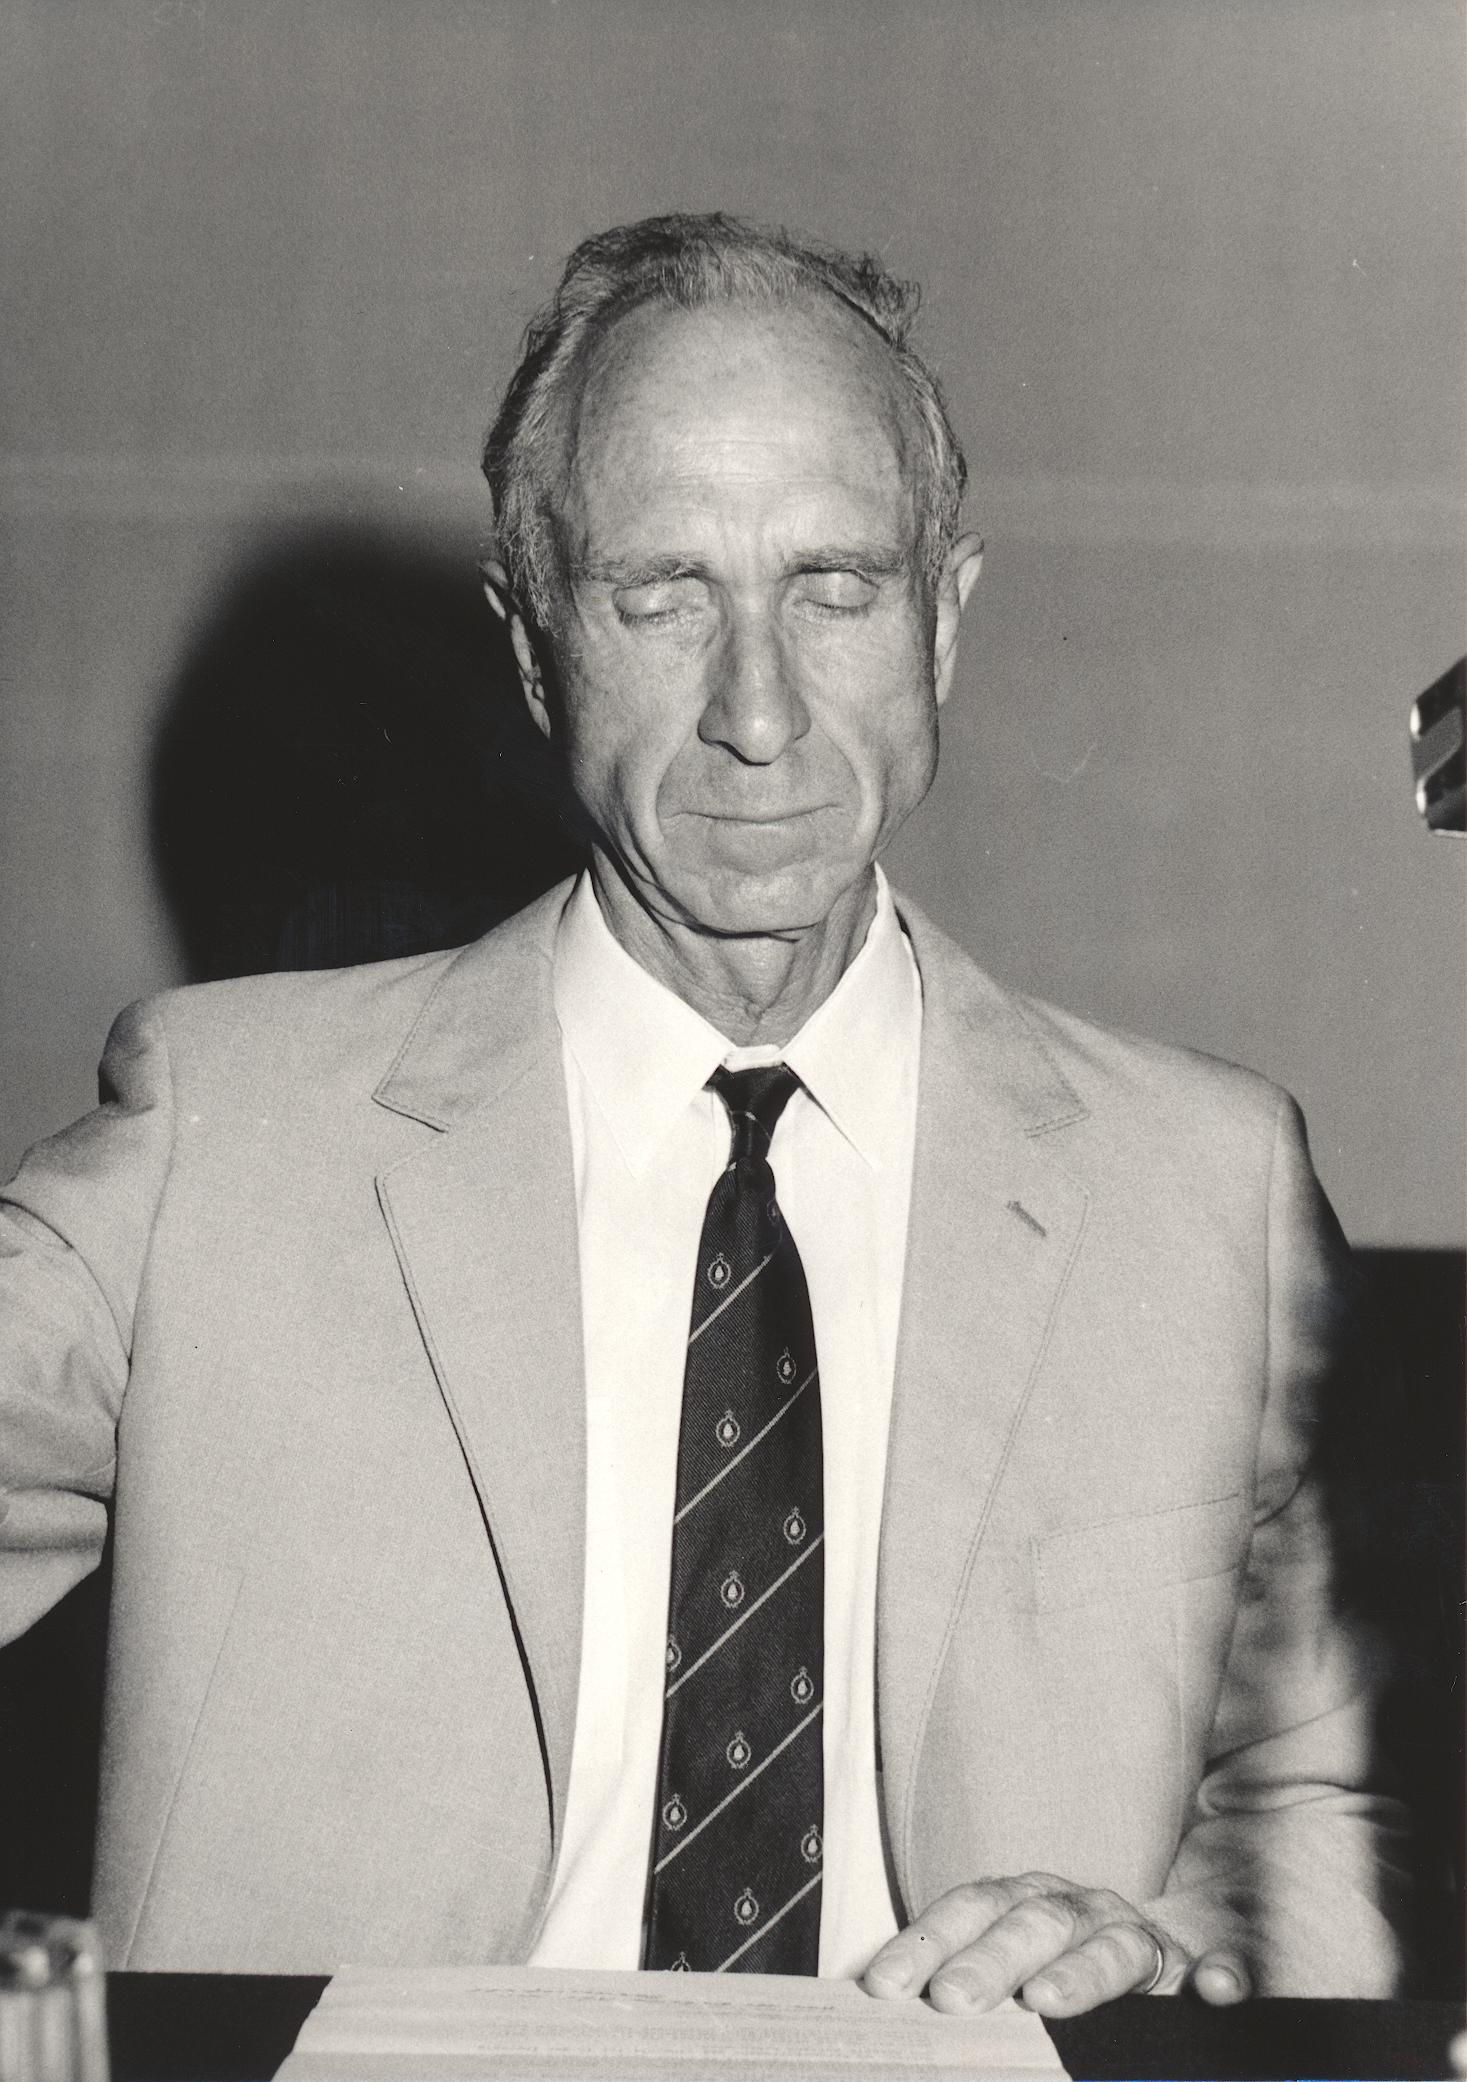 VIII. Internat. Imago Mundi-Kongress 1980, Innsbruck, Prof. Alex Schneider